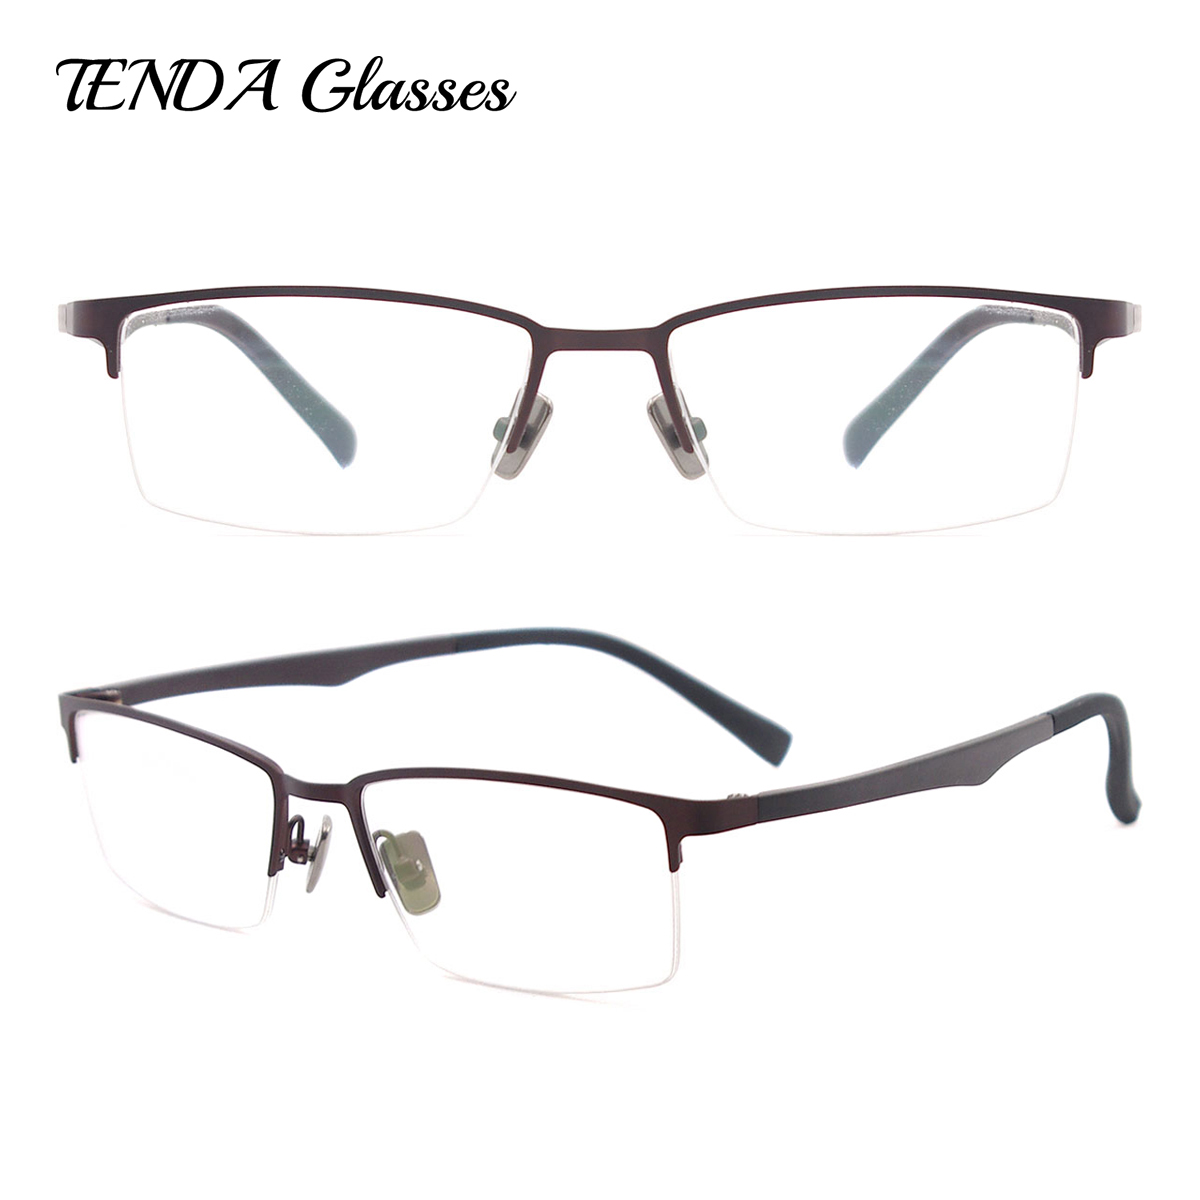 Metal Metade Rim Óculos Flexíveis Óculos Moda Miopia Homens Óculos De  Prescrição de Óculos 270bdf4330